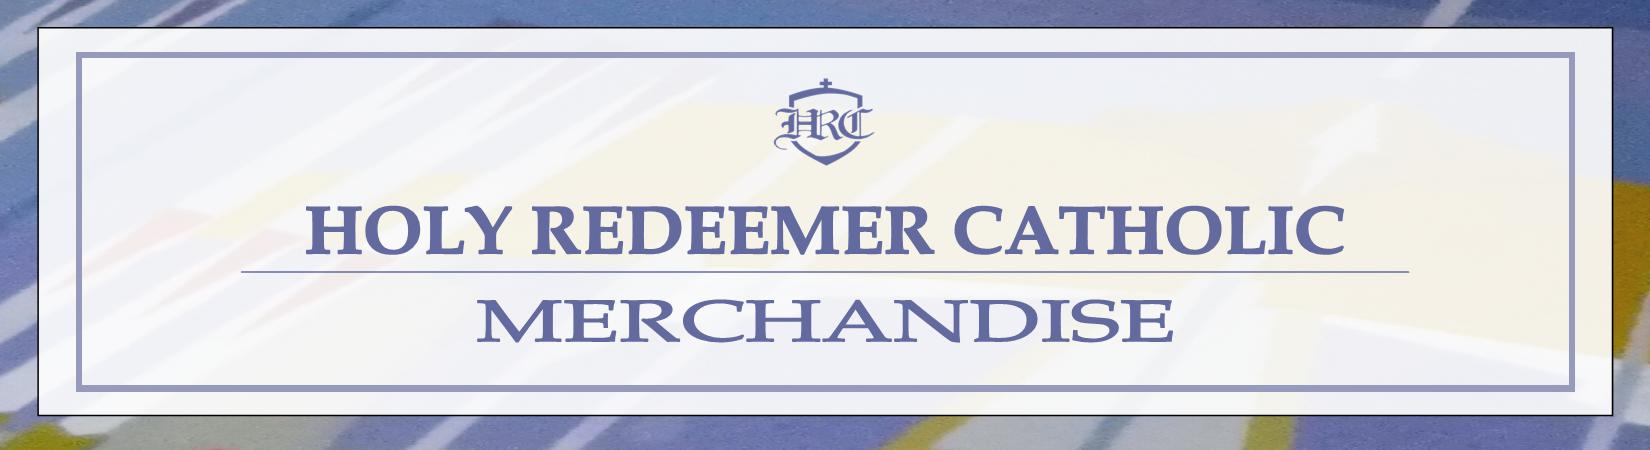 HRC merchandise.jpg